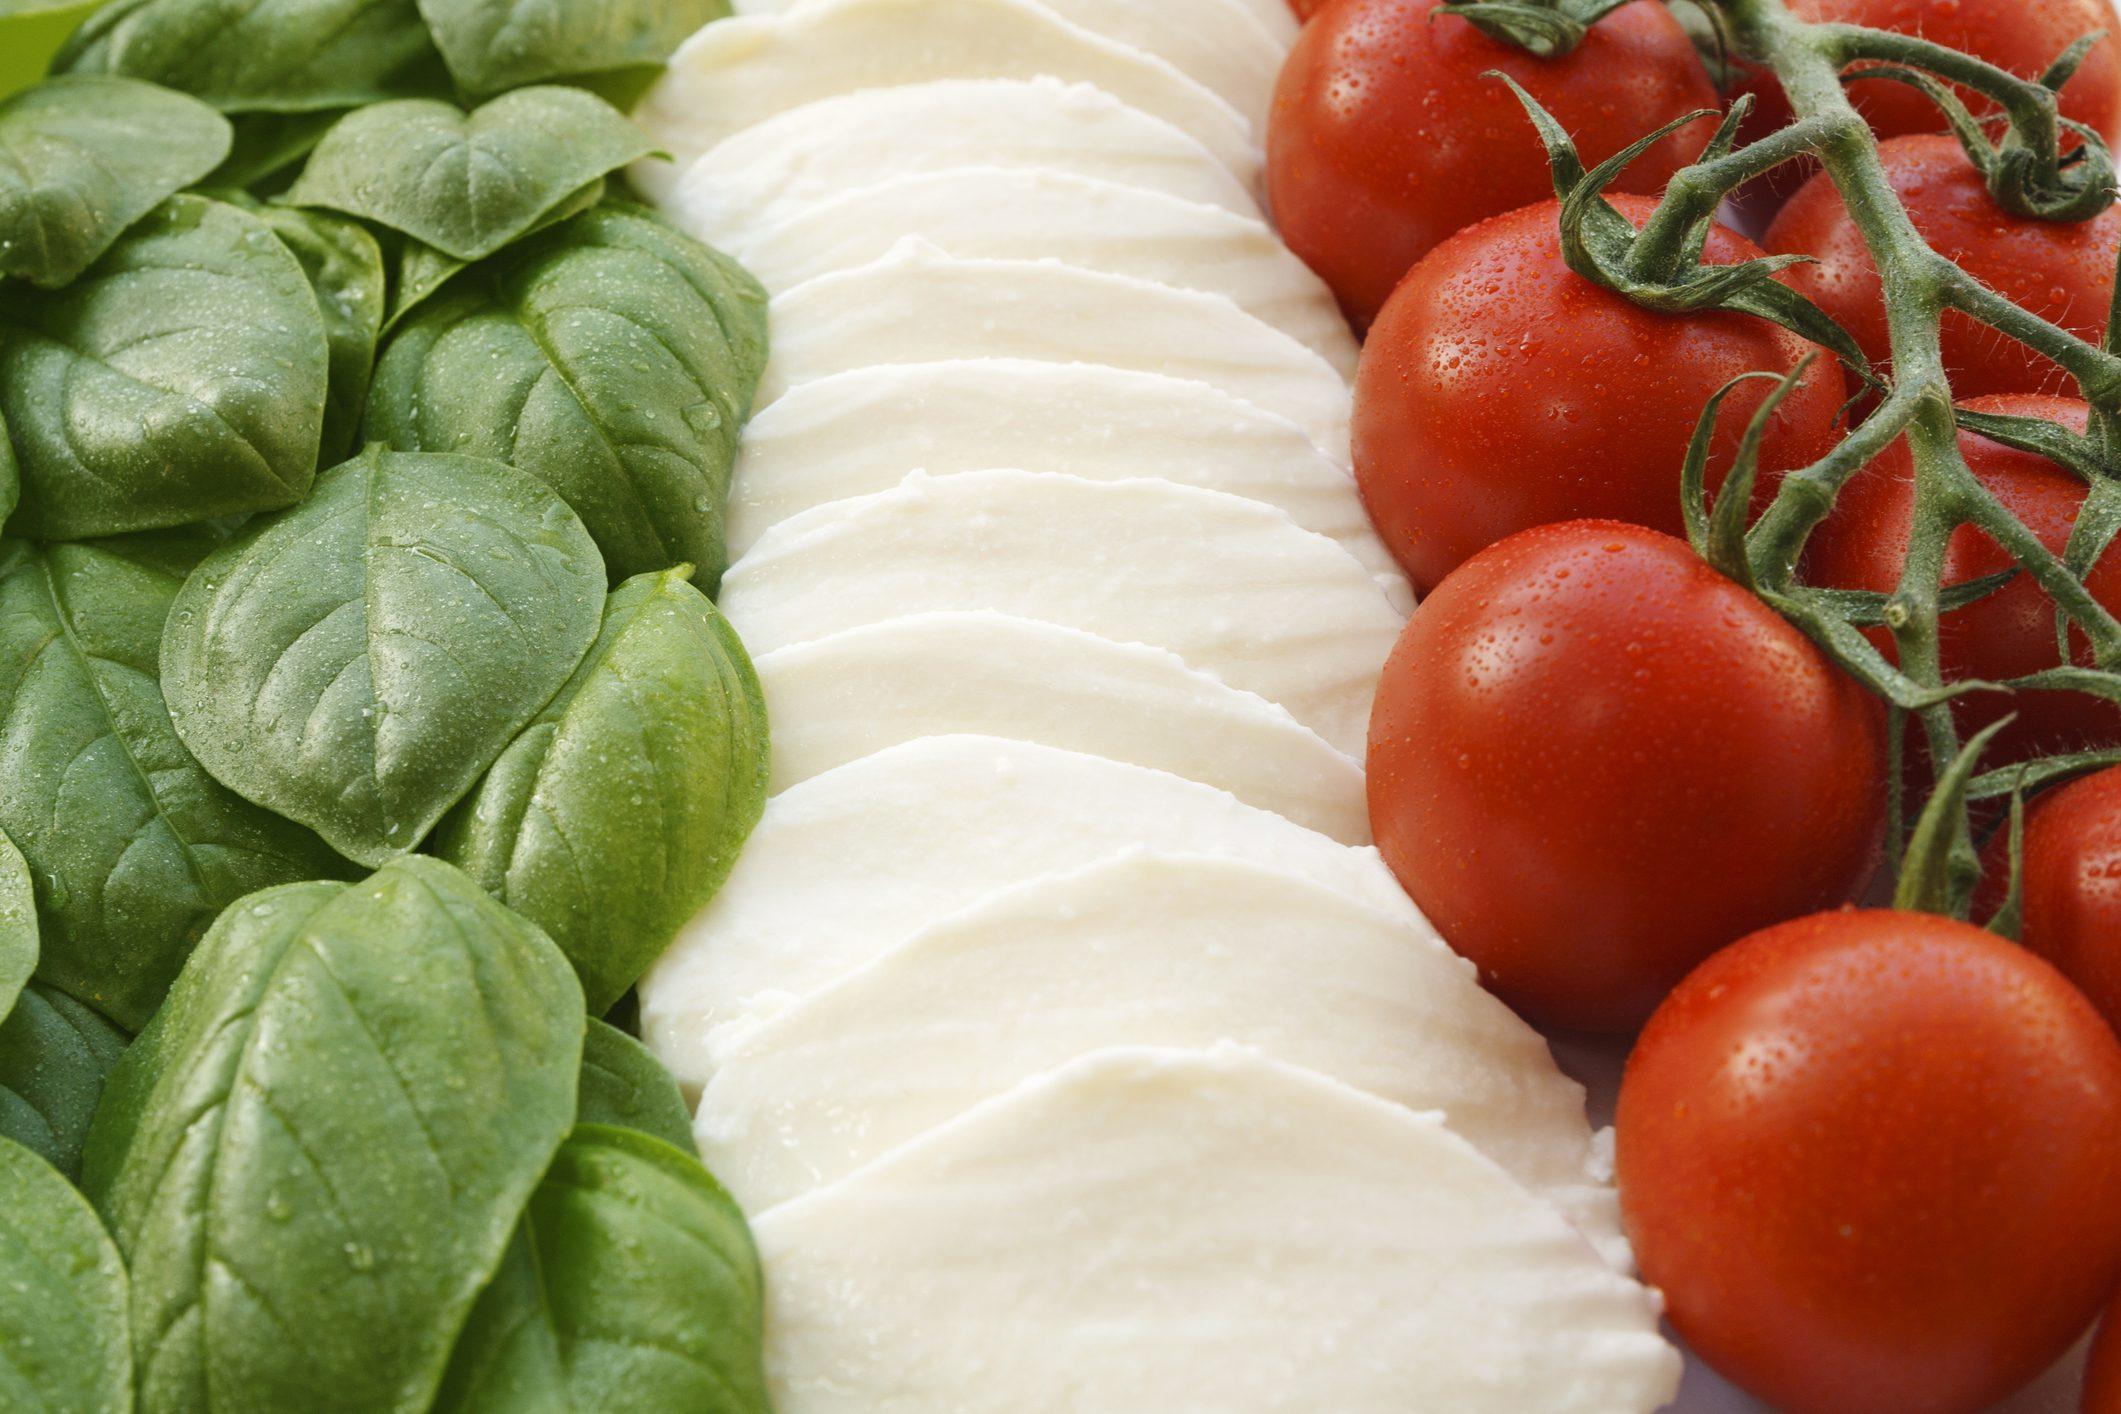 L'Italia batte la Francia a casa sua: la mozzarella supera il camembert per vendite